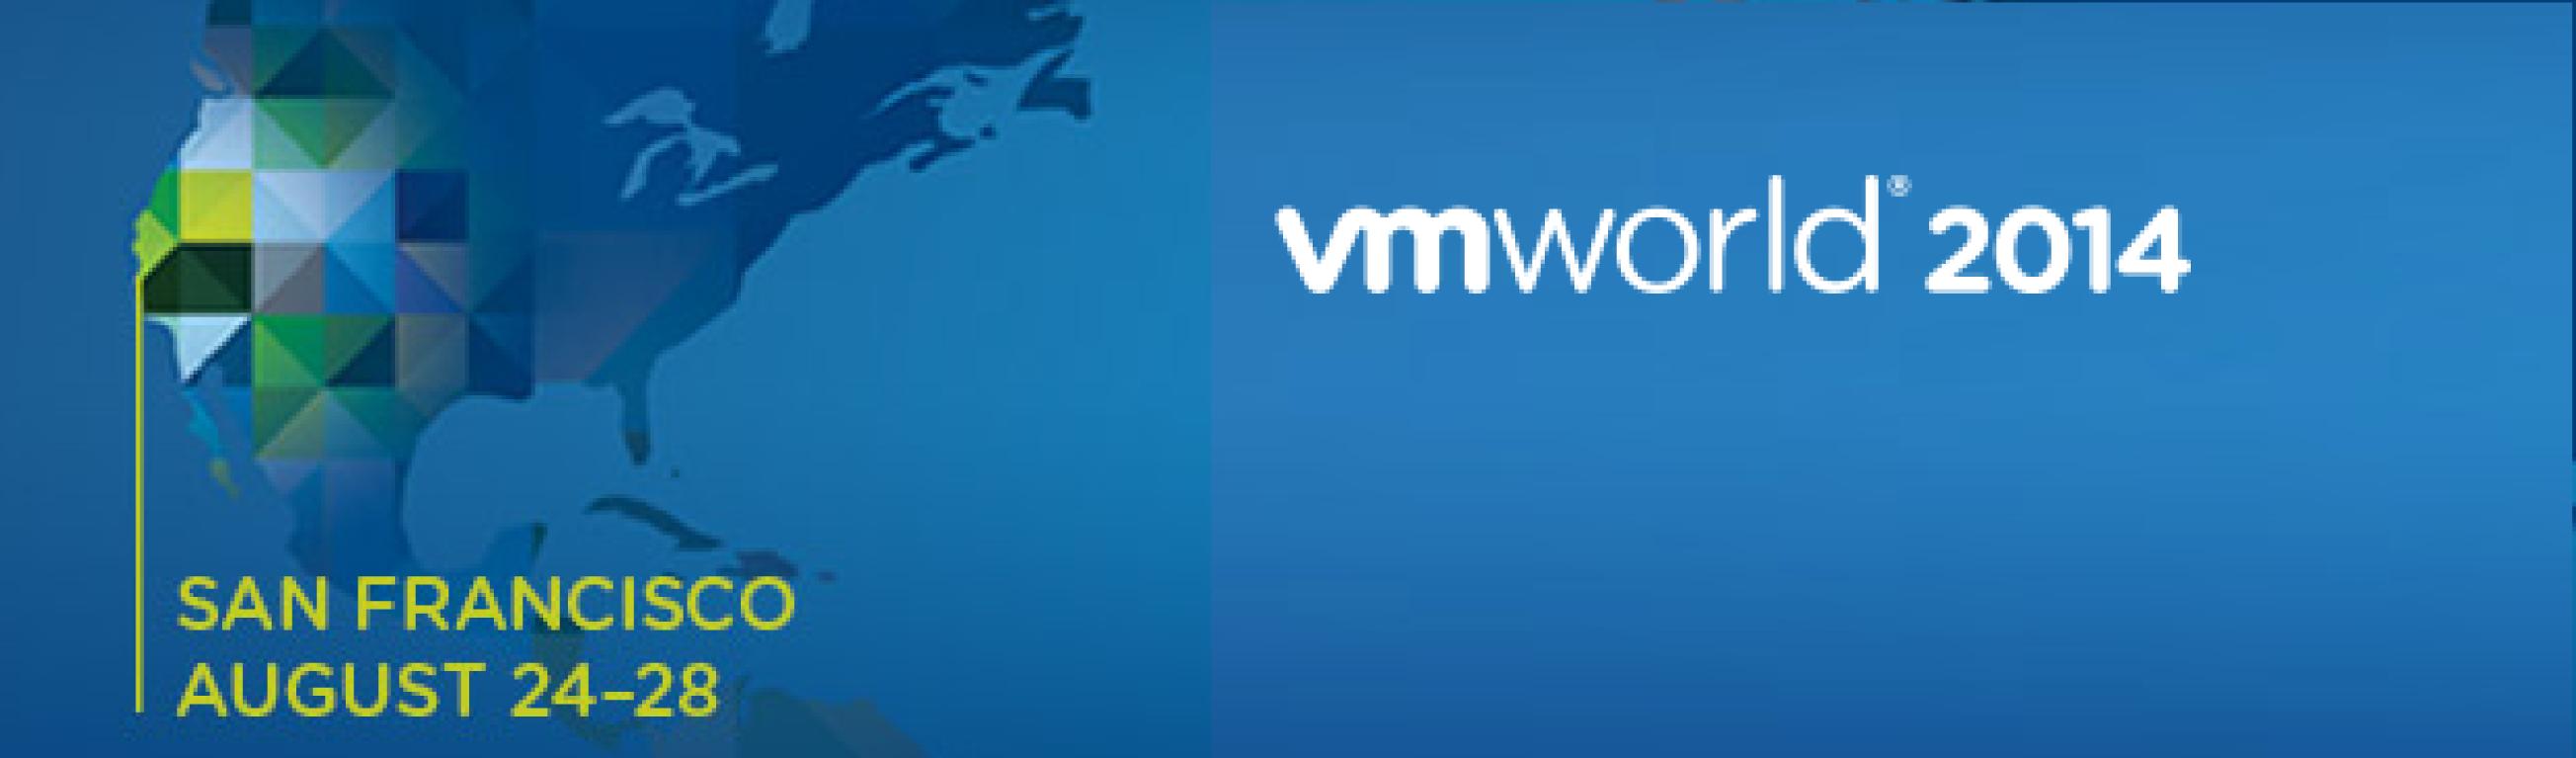 VMworld 2014